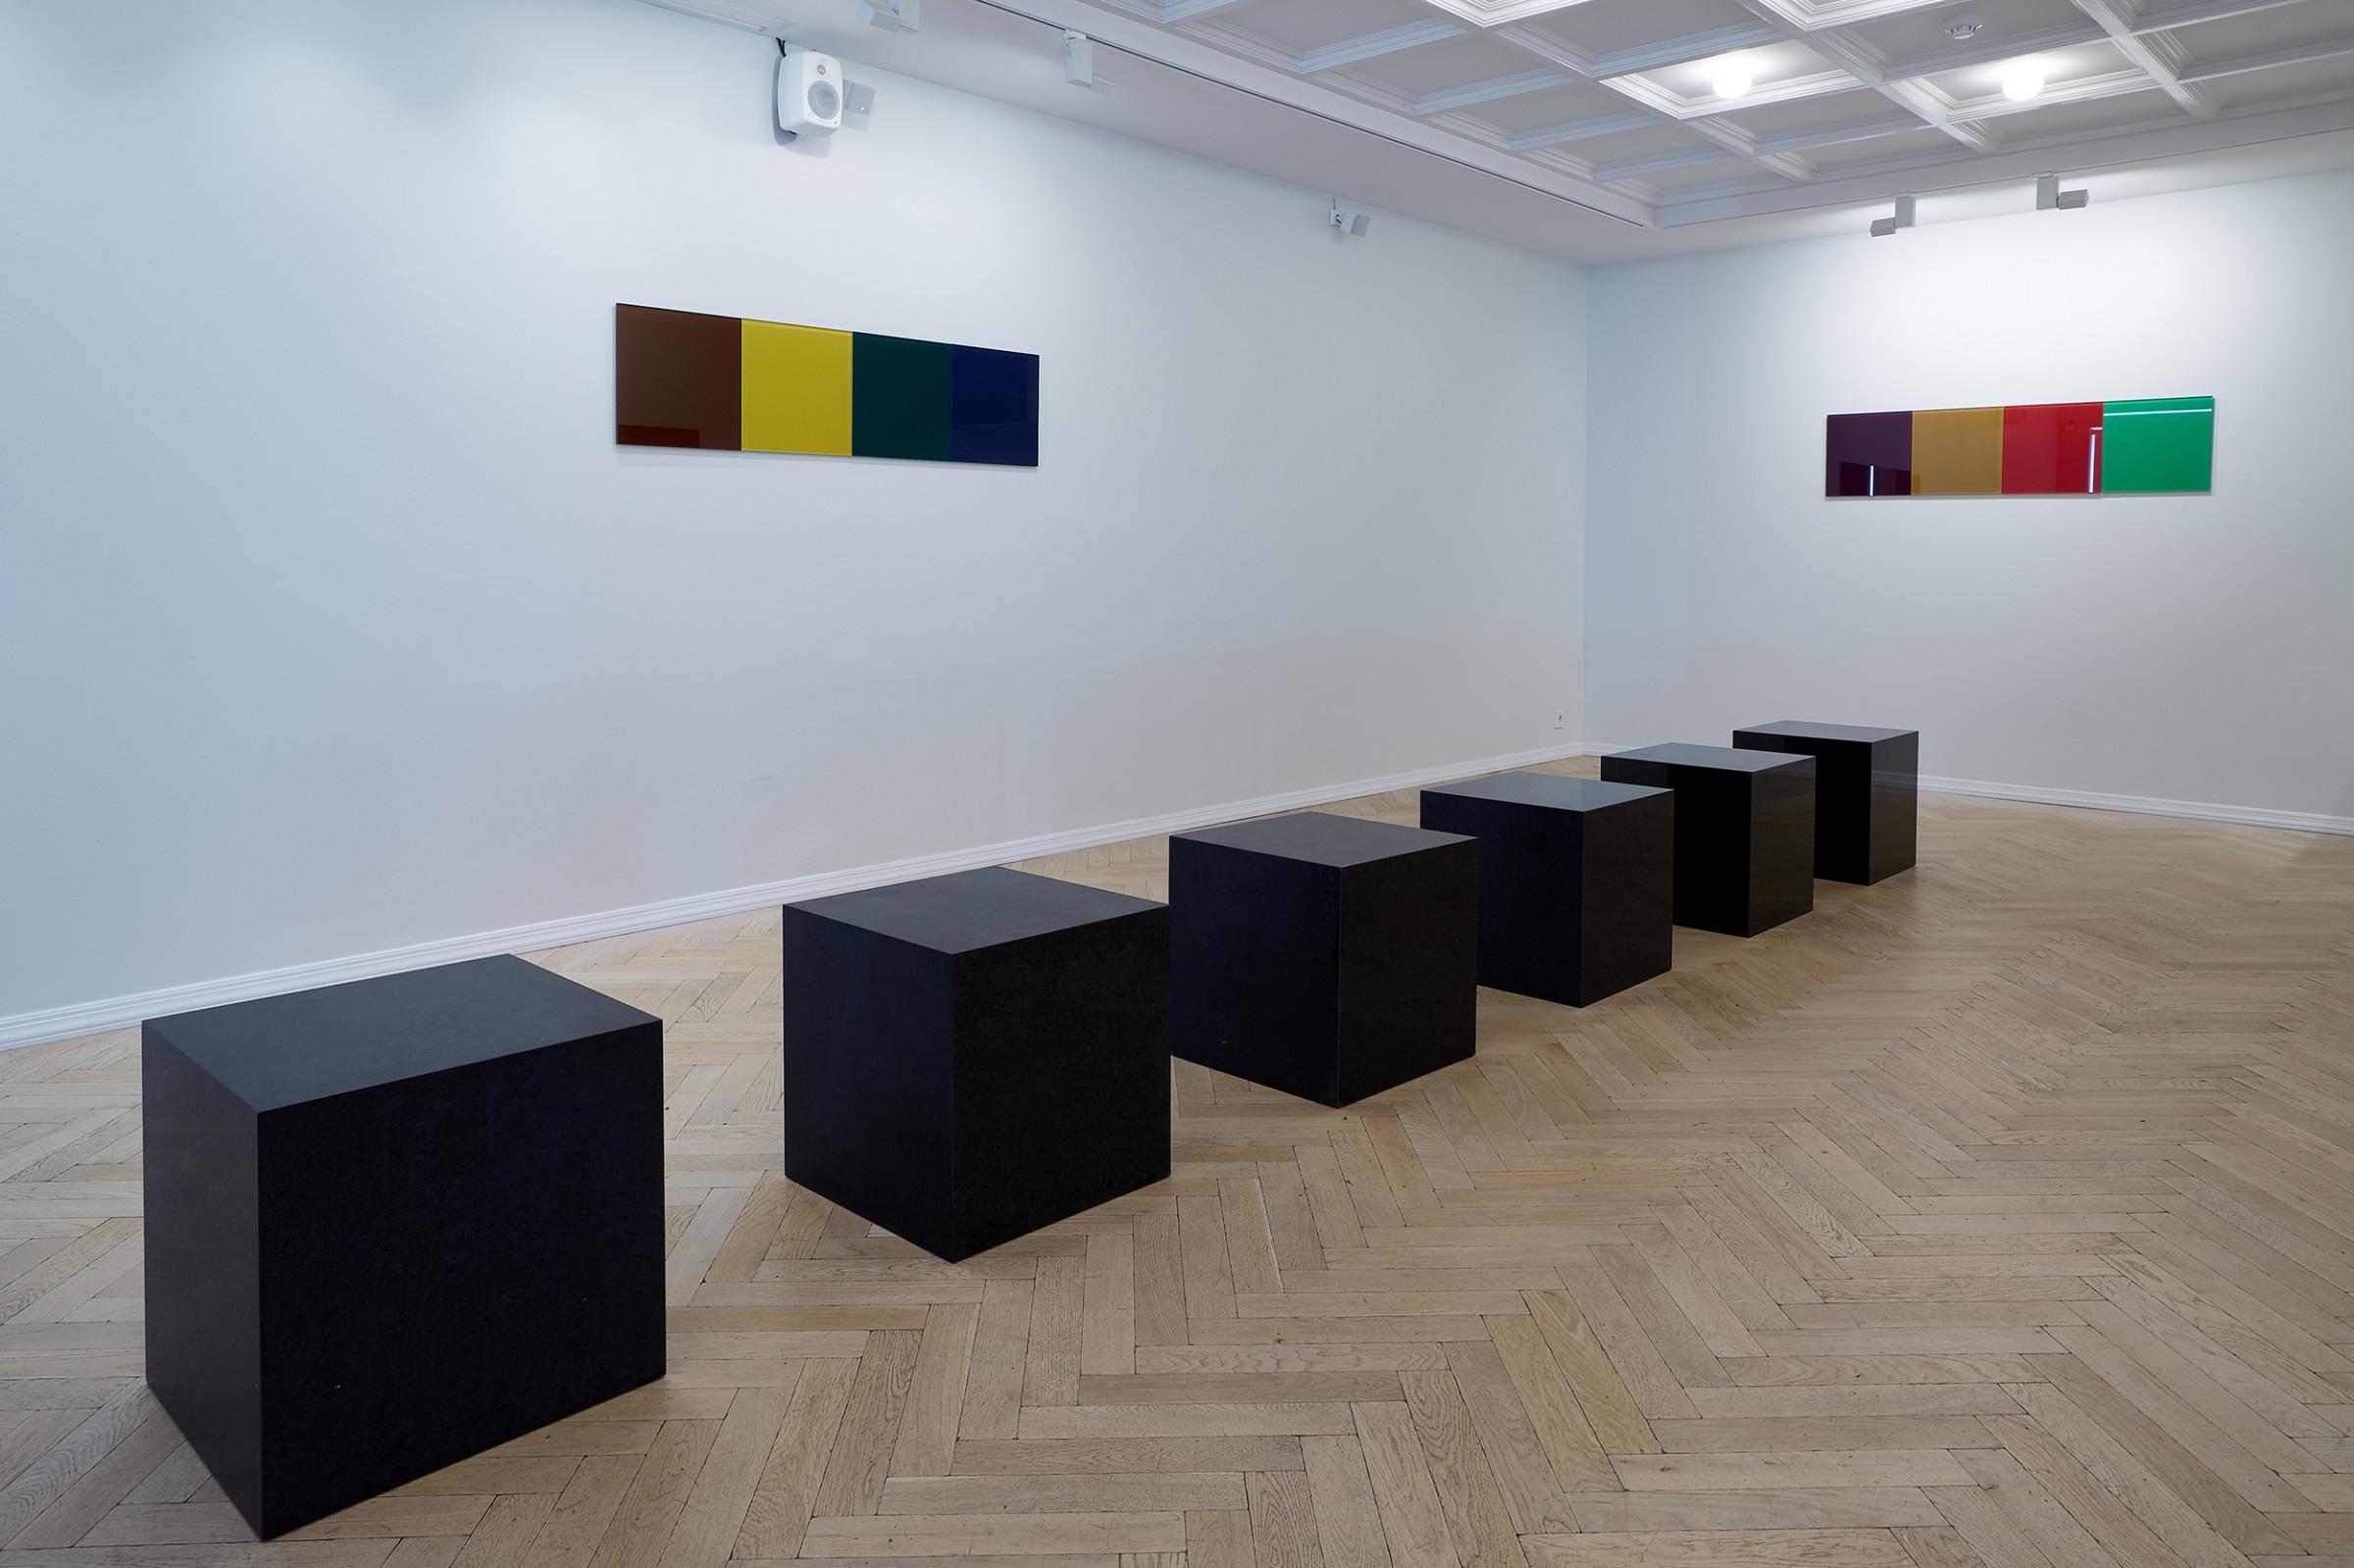 "<span class=""link fancybox-details-link""><a href=""/artists/43-or-vigfusson/works/14523/"">View Detail Page</a></span><div class=""artist""><strong>ÞÓR VIGFÚSSON</strong></div> <div class=""title""><em>Untitled </em>, 2005</div> <div class=""medium"">polished granite</div> <div class=""dimensions"">45 x 45 x 495 cm<br /> 6 cubes each 45 x 45 x 45 cm</div>"